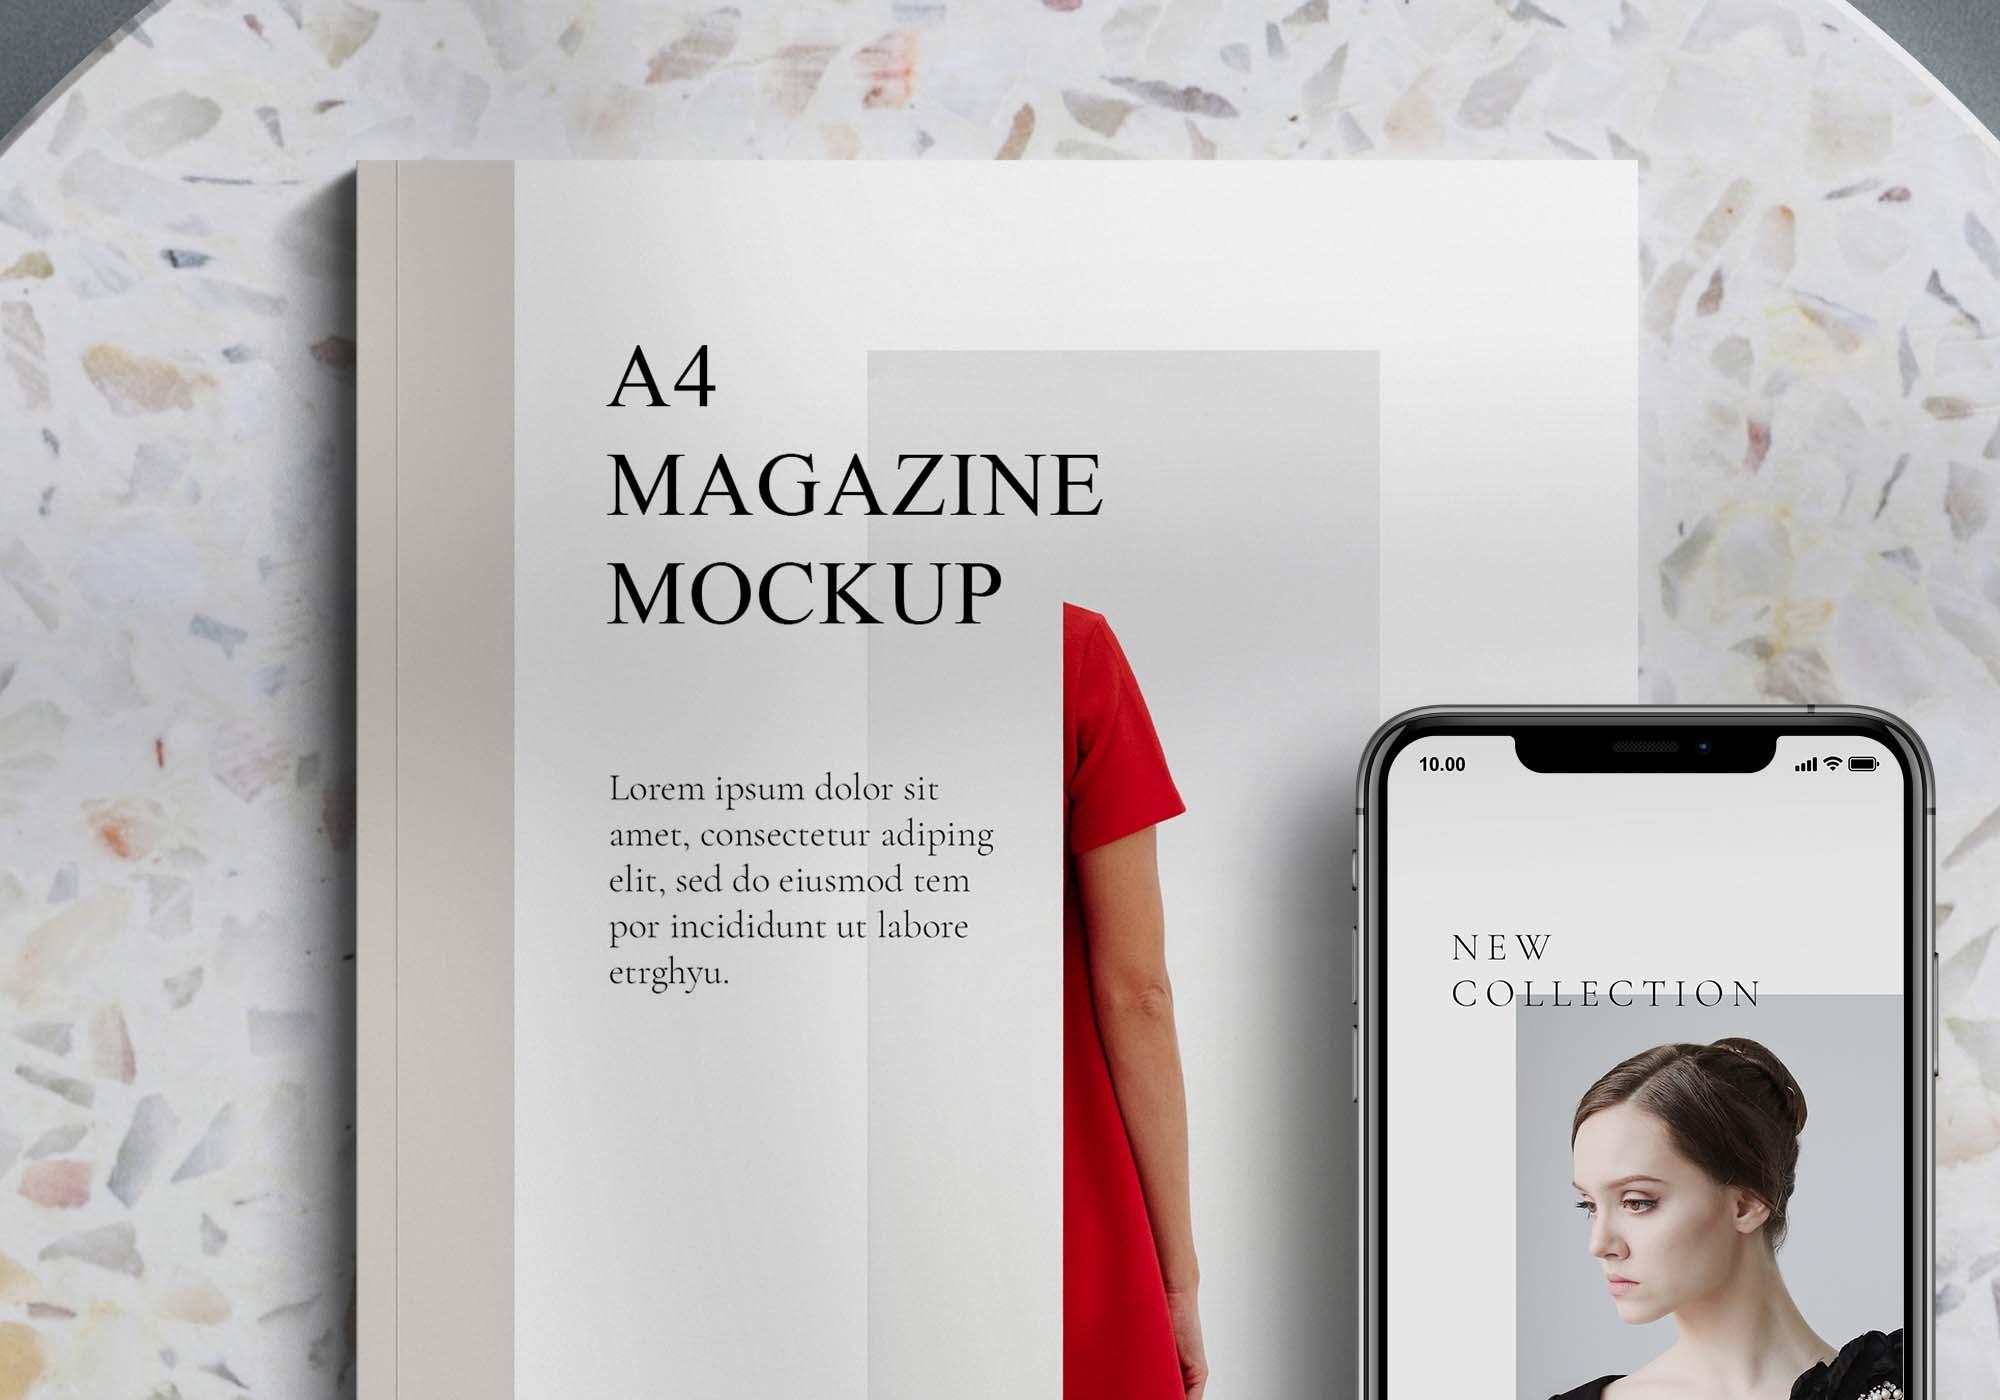 Magazine and Phone Mockup